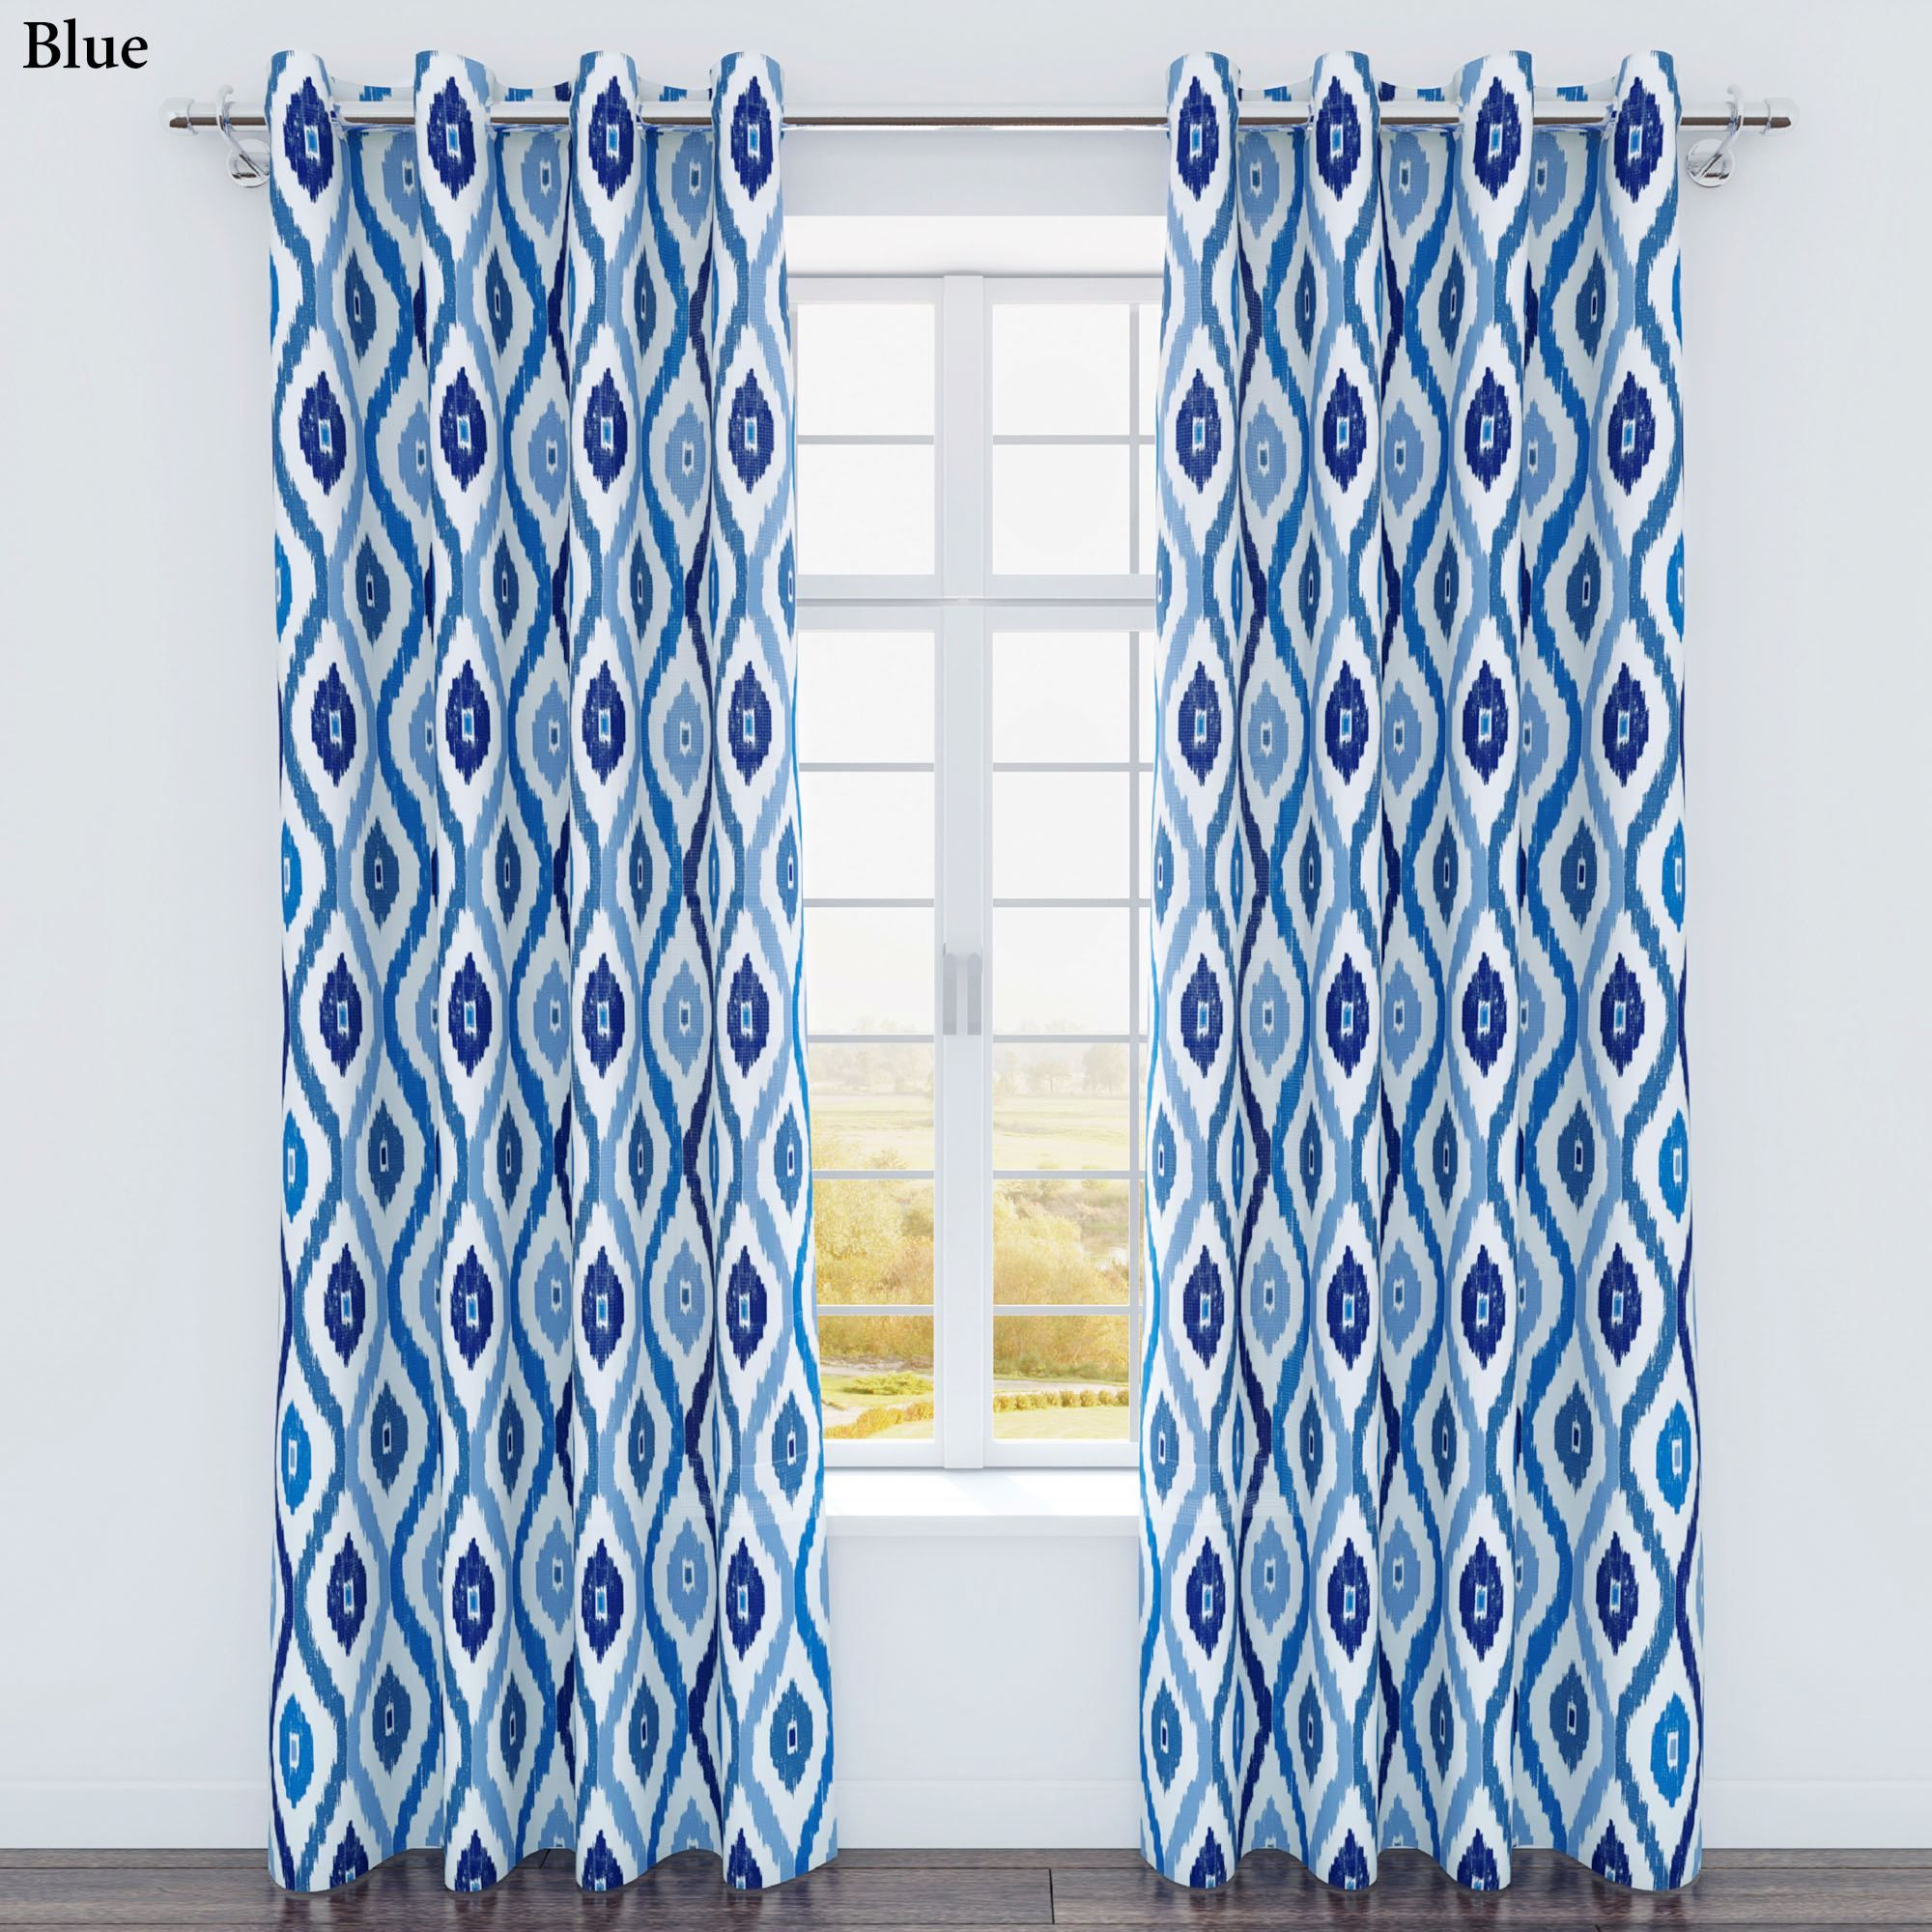 Ikat curtain panels - Luna Ikat Medallion Grommet Curtain Panels